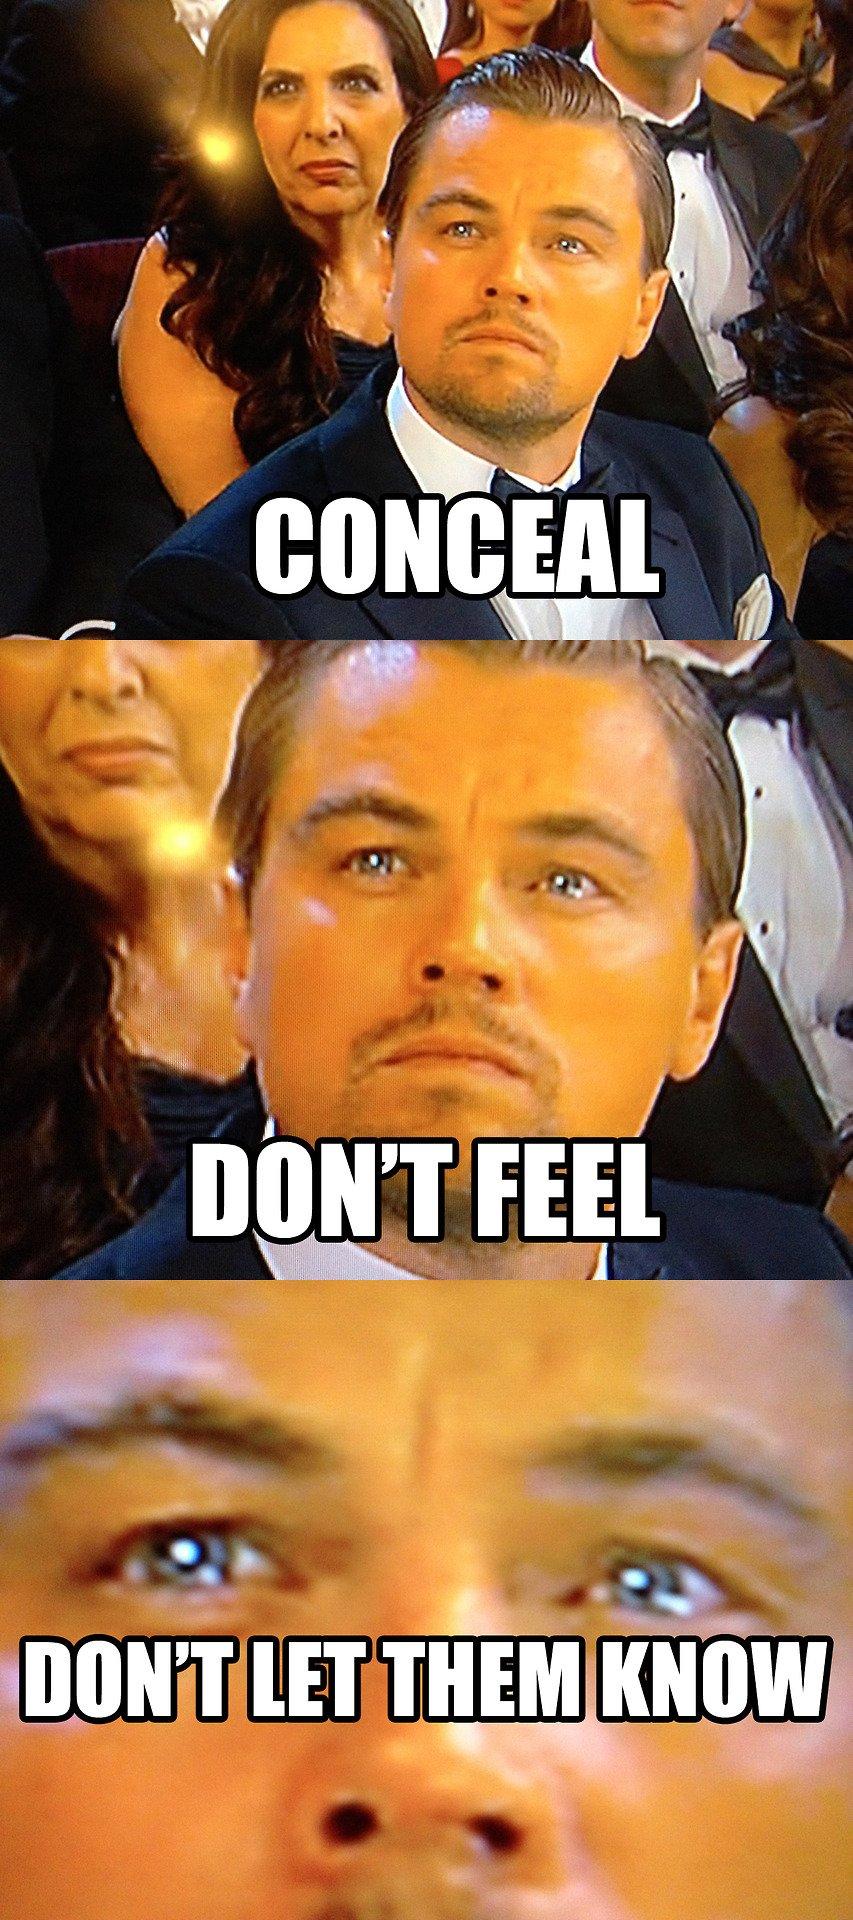 Bang Leo nggak mau kelihatan sedih